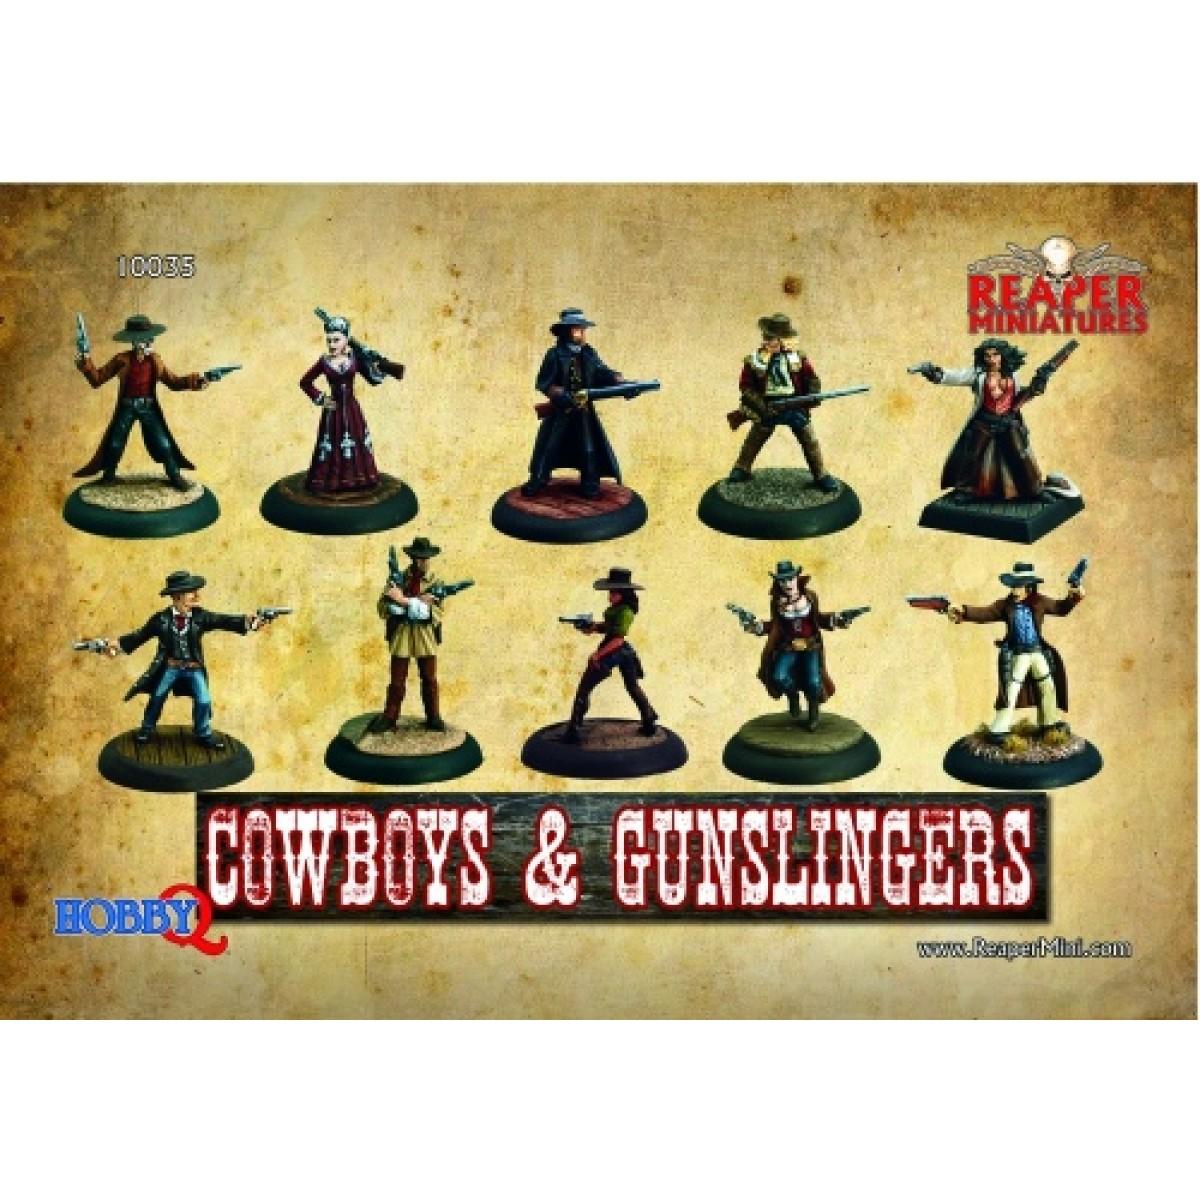 Reaper Miniatures - Boxed Sets: Cowboys & Gunslingers